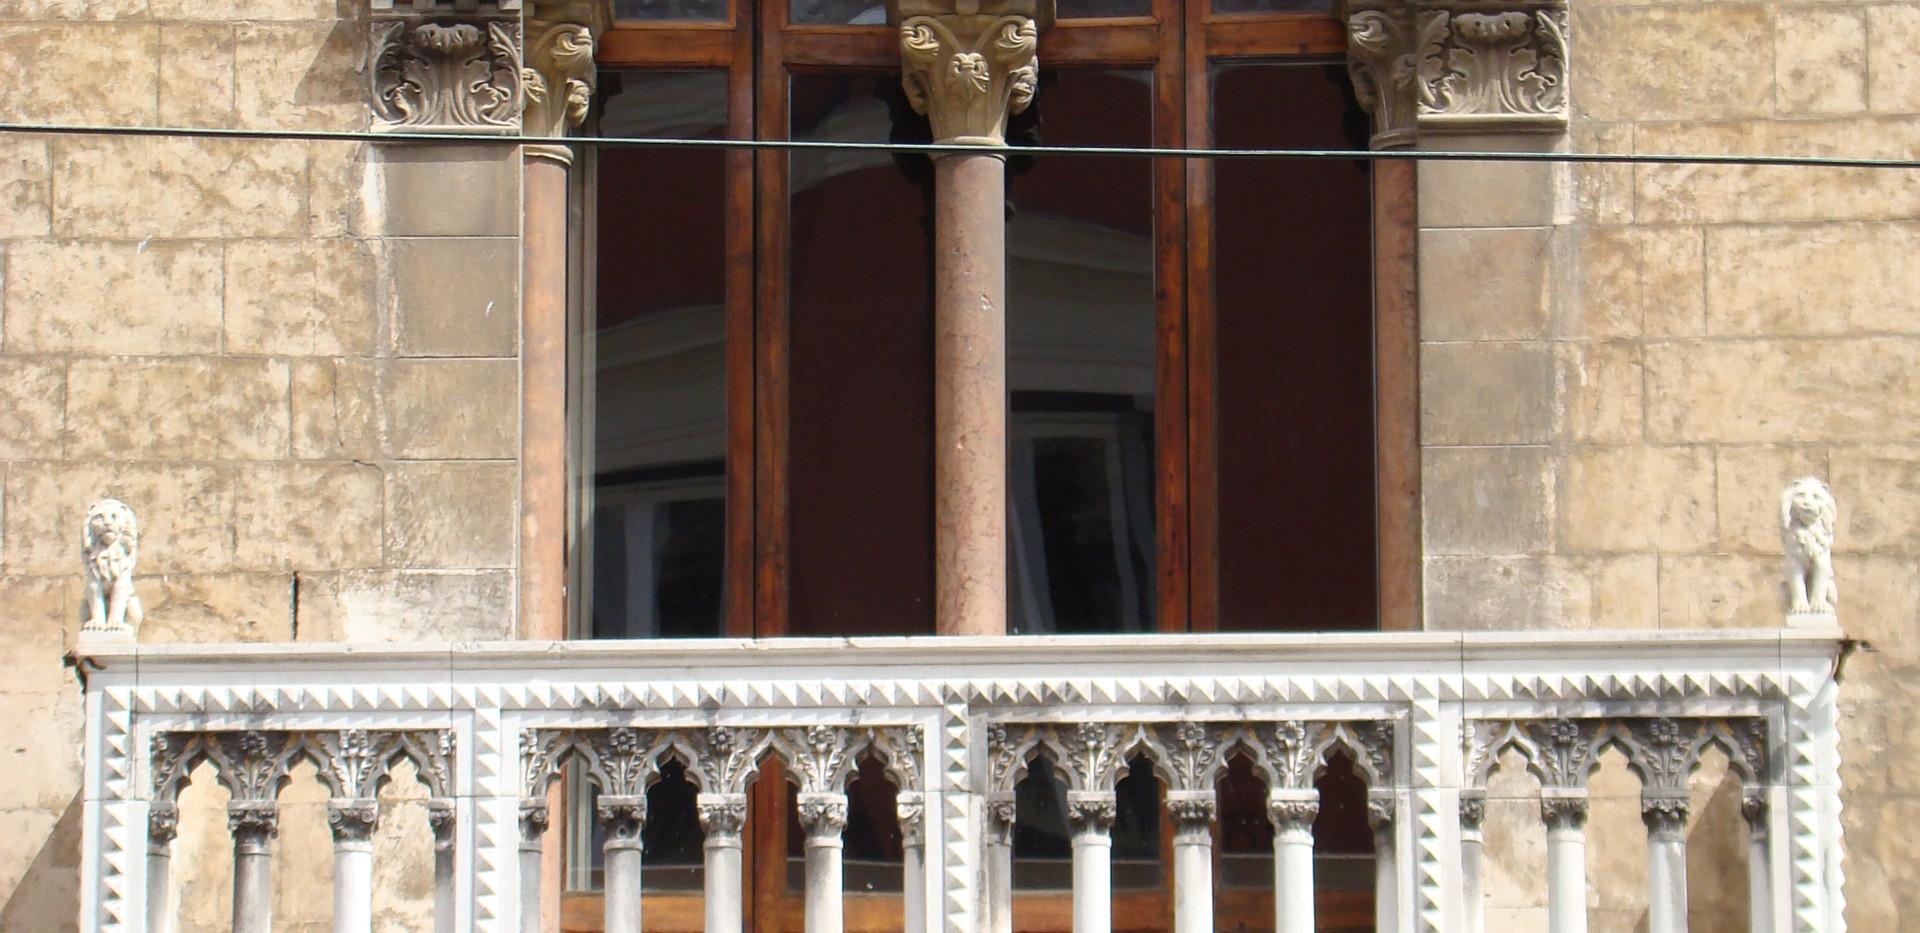 Balcone con bifora